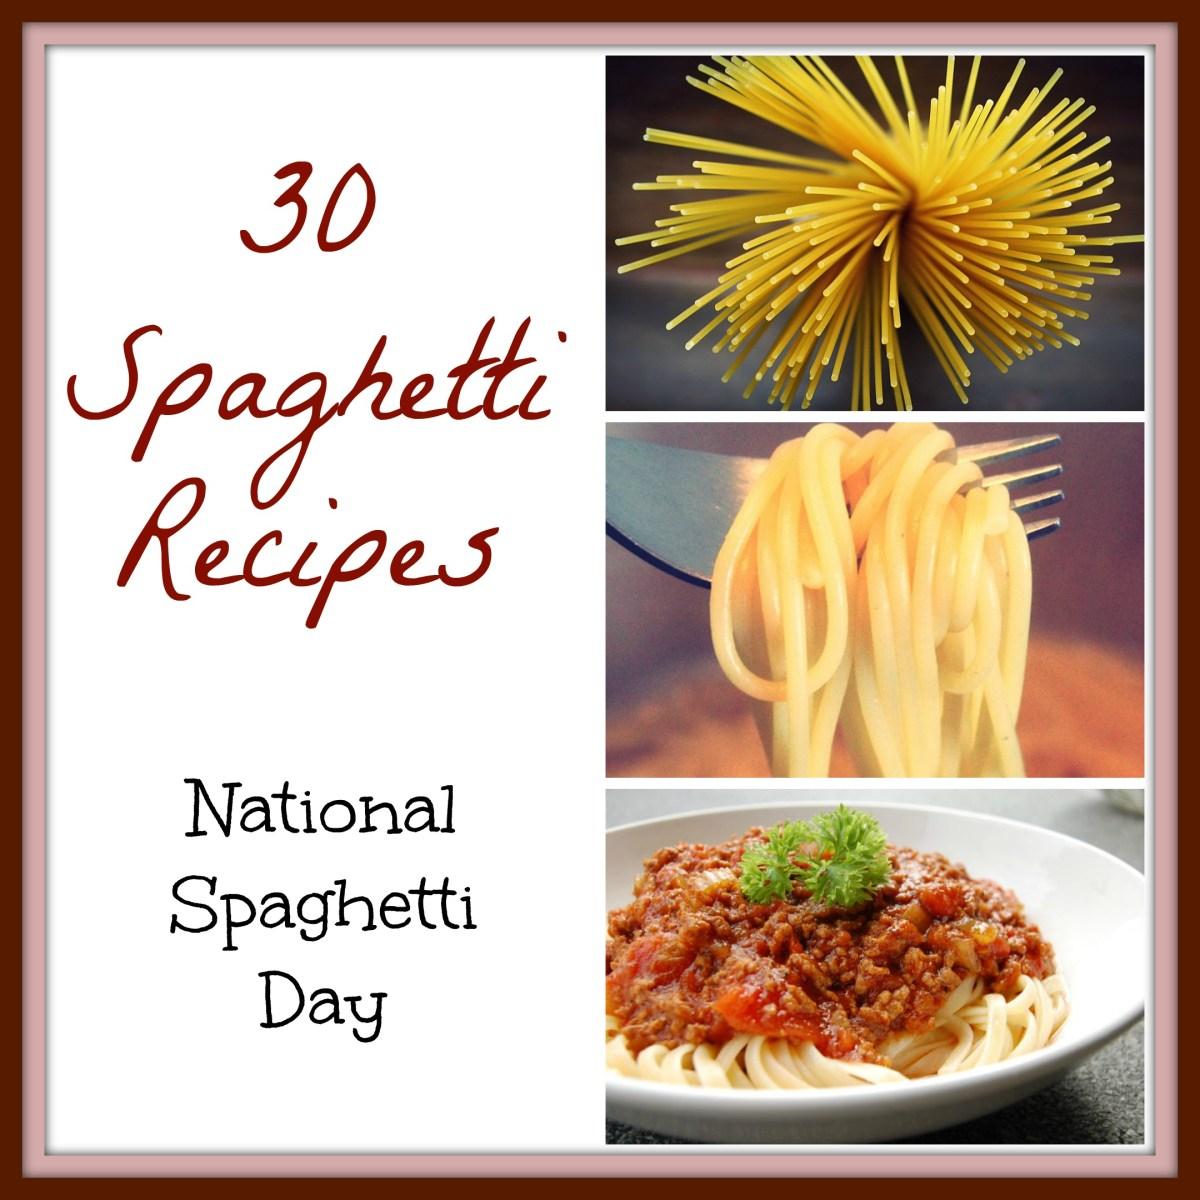 30 Spaghetti Recipes for National Spaghetti Day